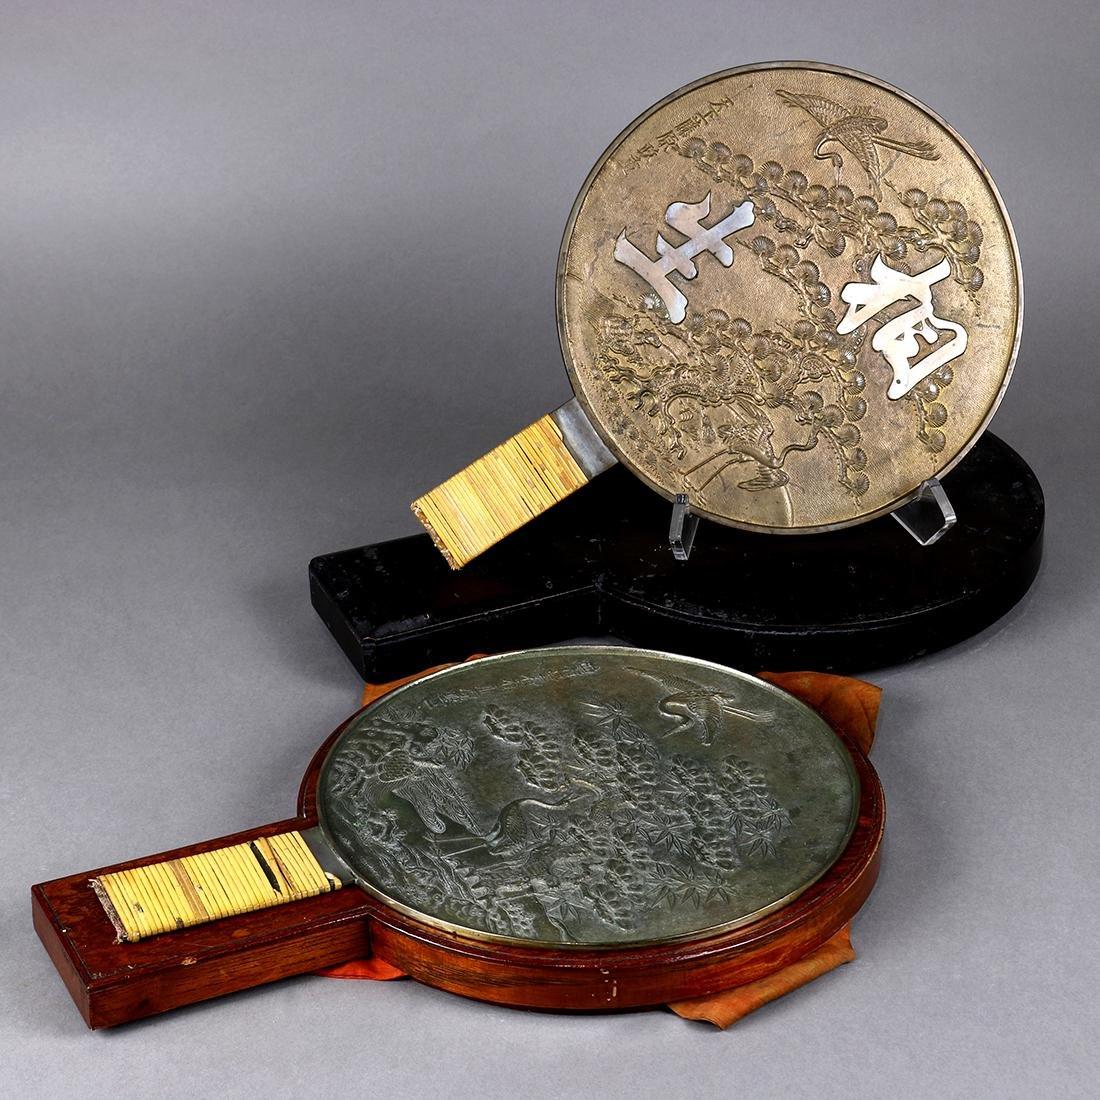 Two Japnese Handheld Mirrors